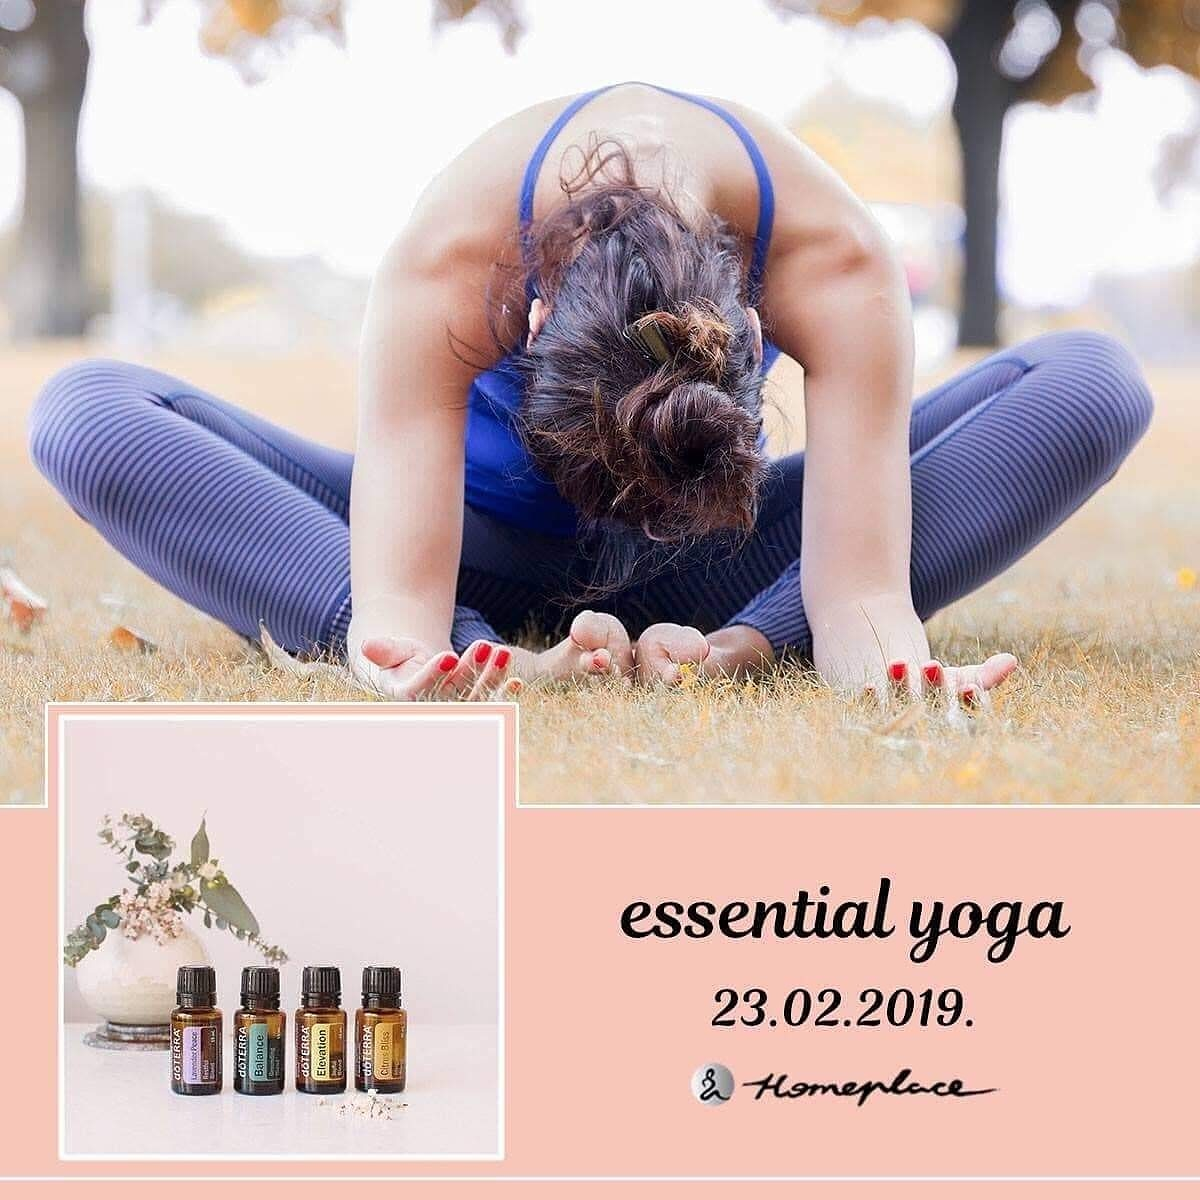 Essential yoga - 23. februar 2019.